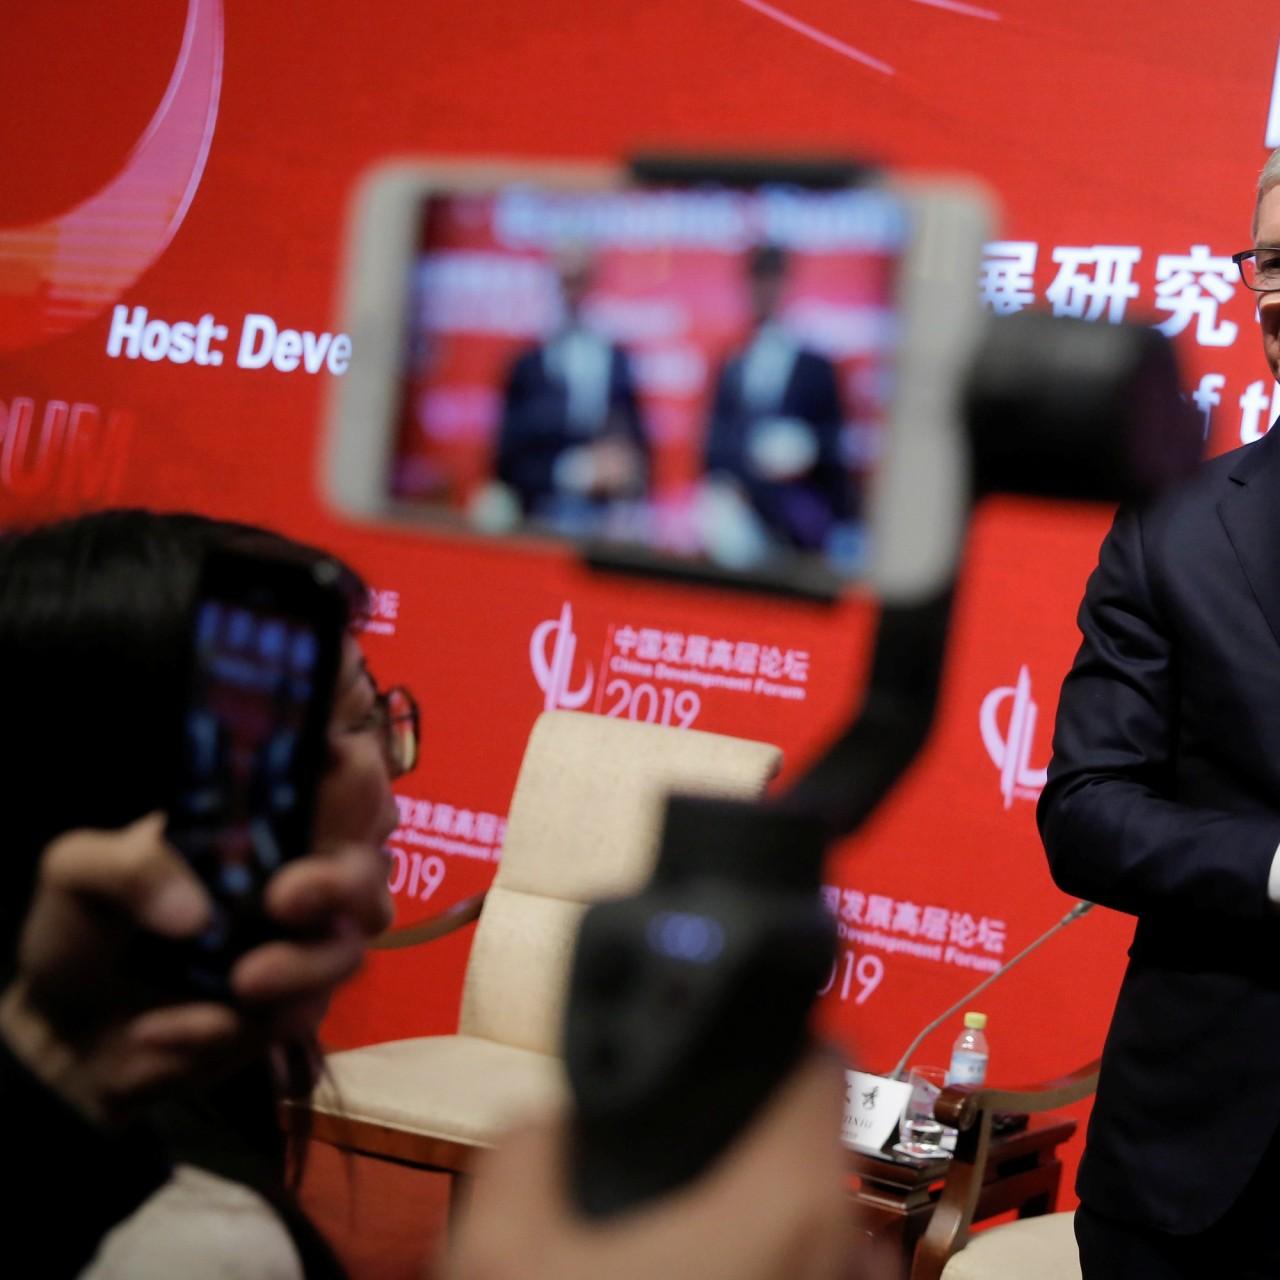 Apple's China woes may worsen as Huawei ban nudges die-hard